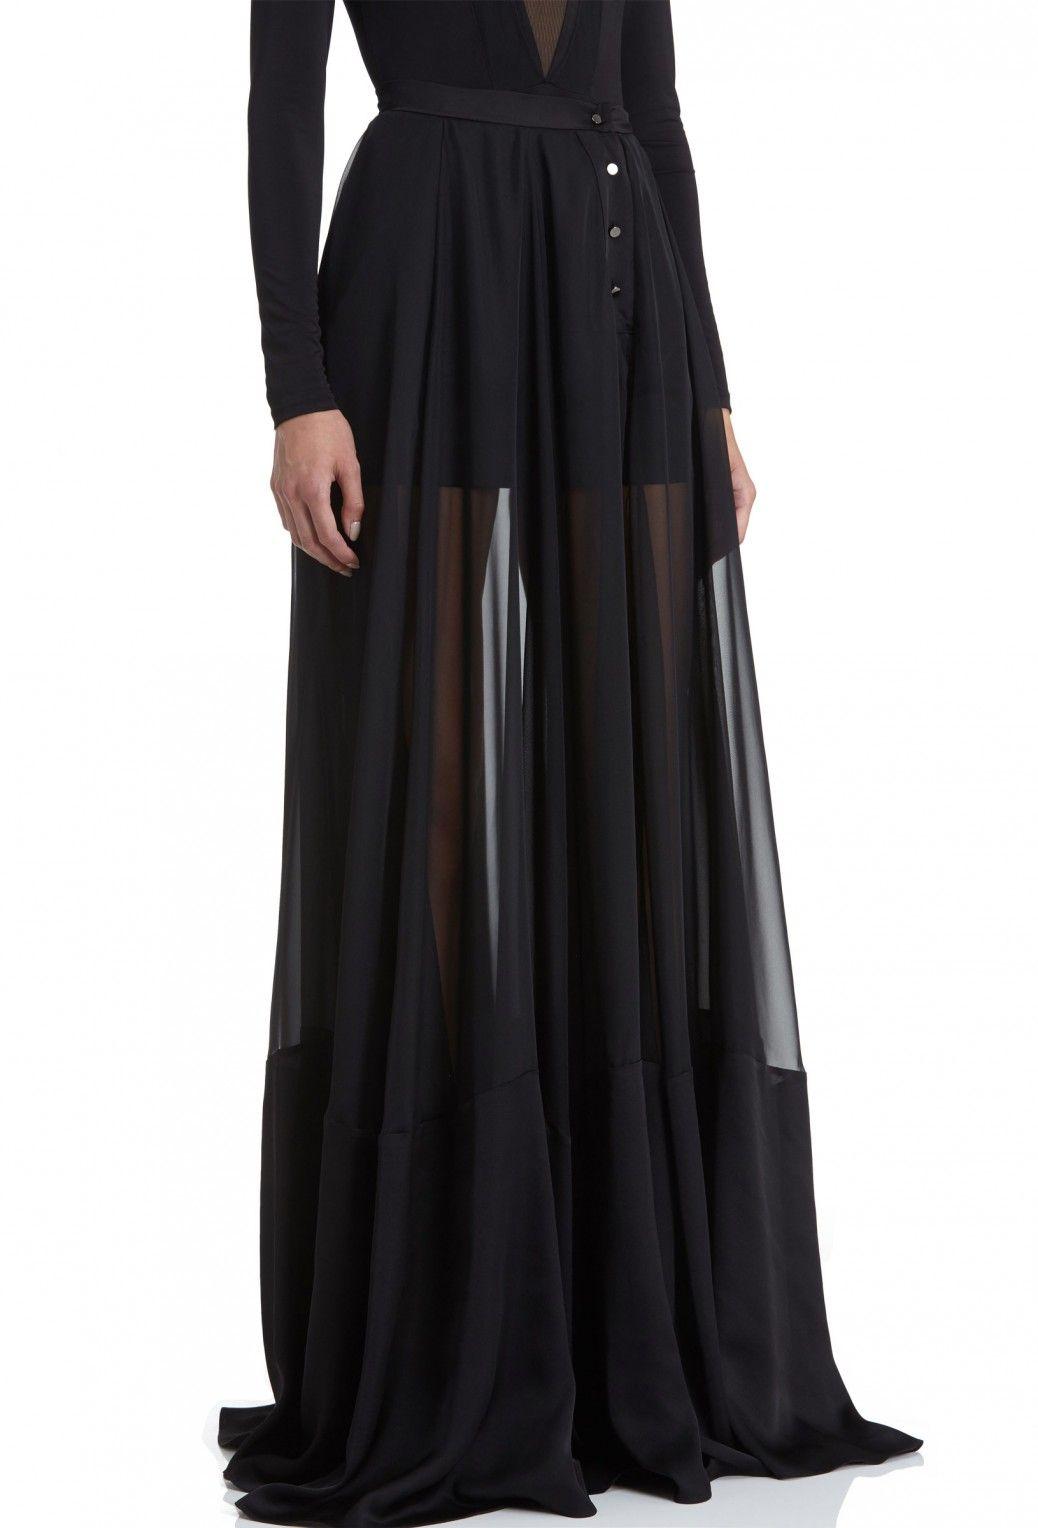 4e08beb58 Image 2 of AQ/AQ Peshley Sheer Chiffon Maxi Skirt with Side Split · Black ·